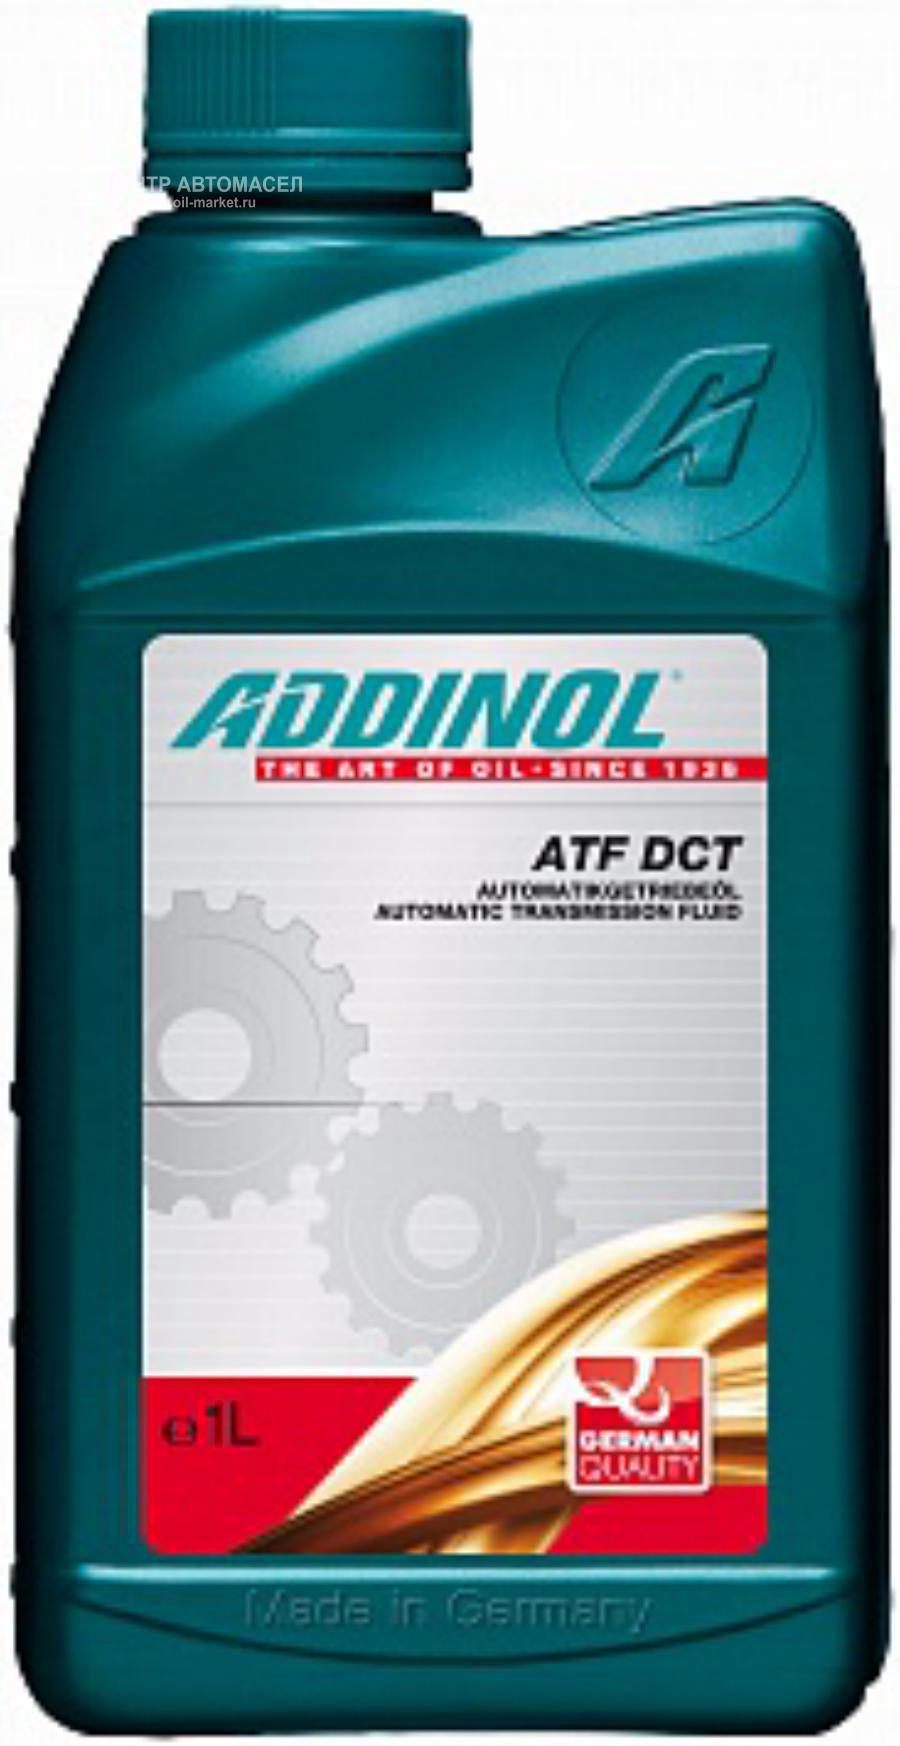 ADDINOL ATF DCT